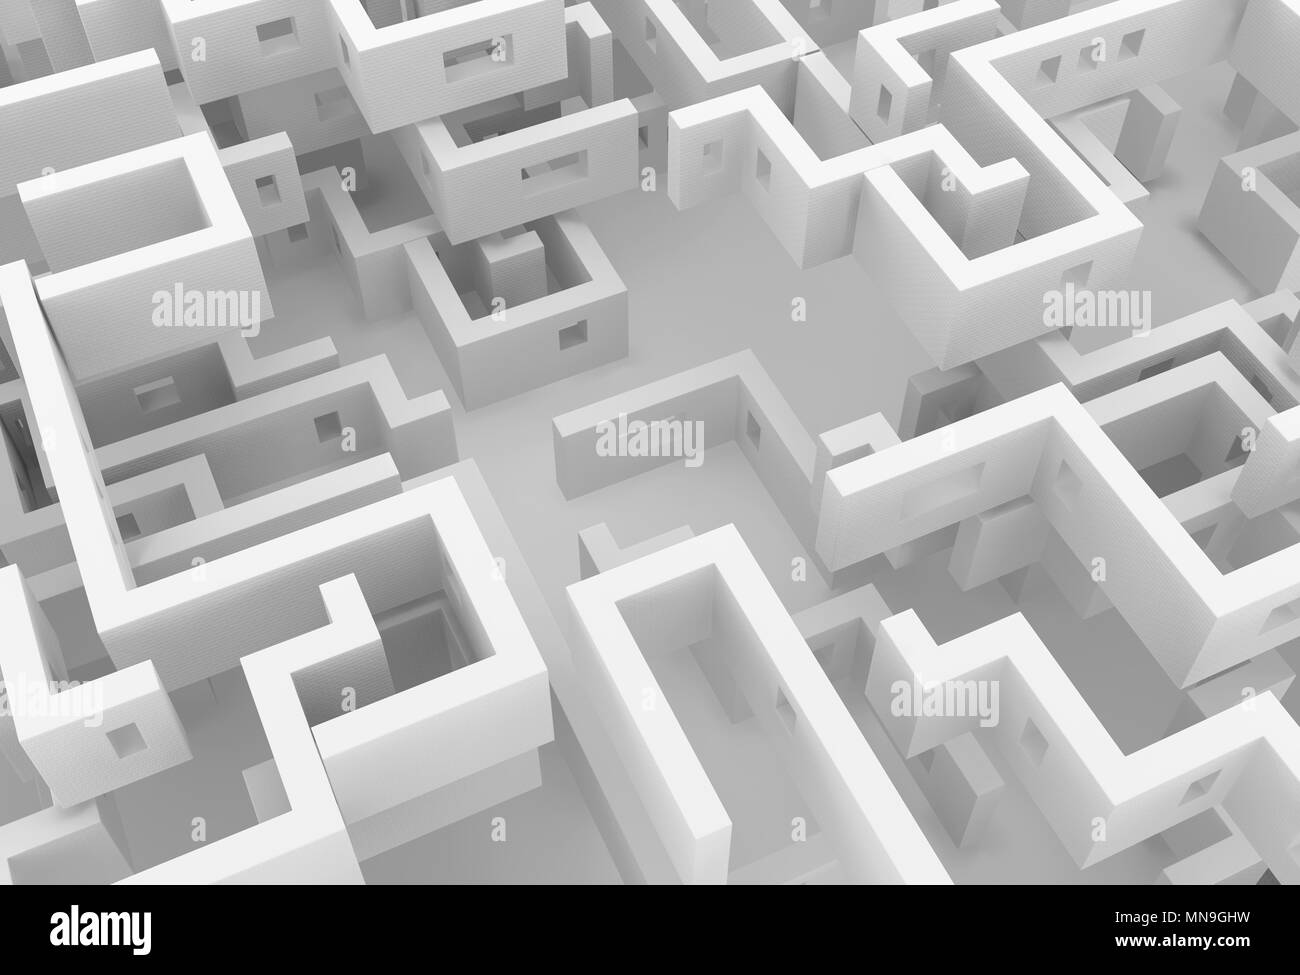 Weiße Wand Labyrinth Labyrinth leeren Raum abstrakt, 3D-Darstellung, horizontal Stockbild